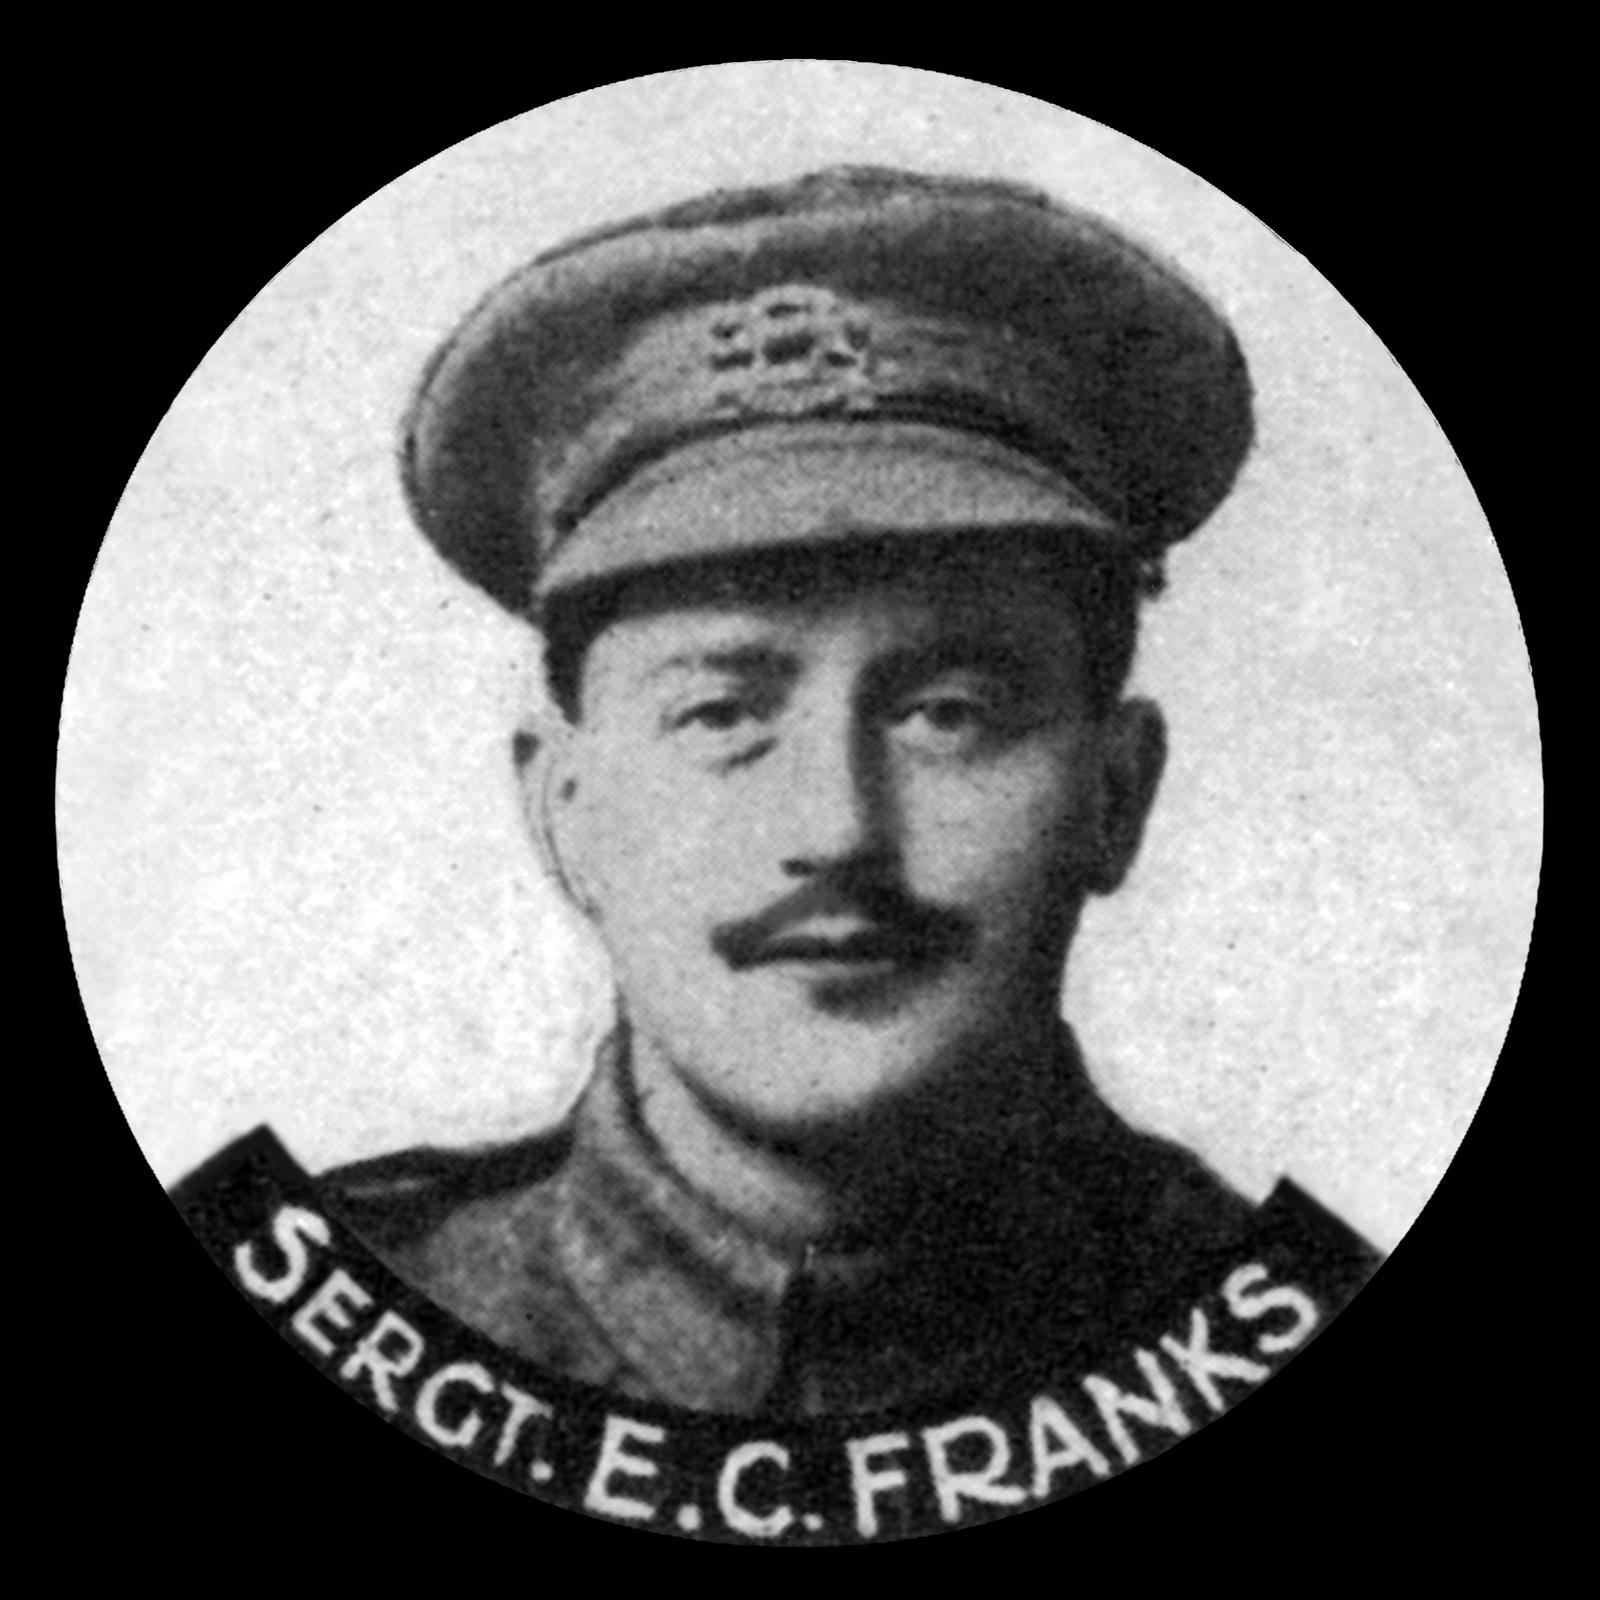 FRANKS Edward Cartwright